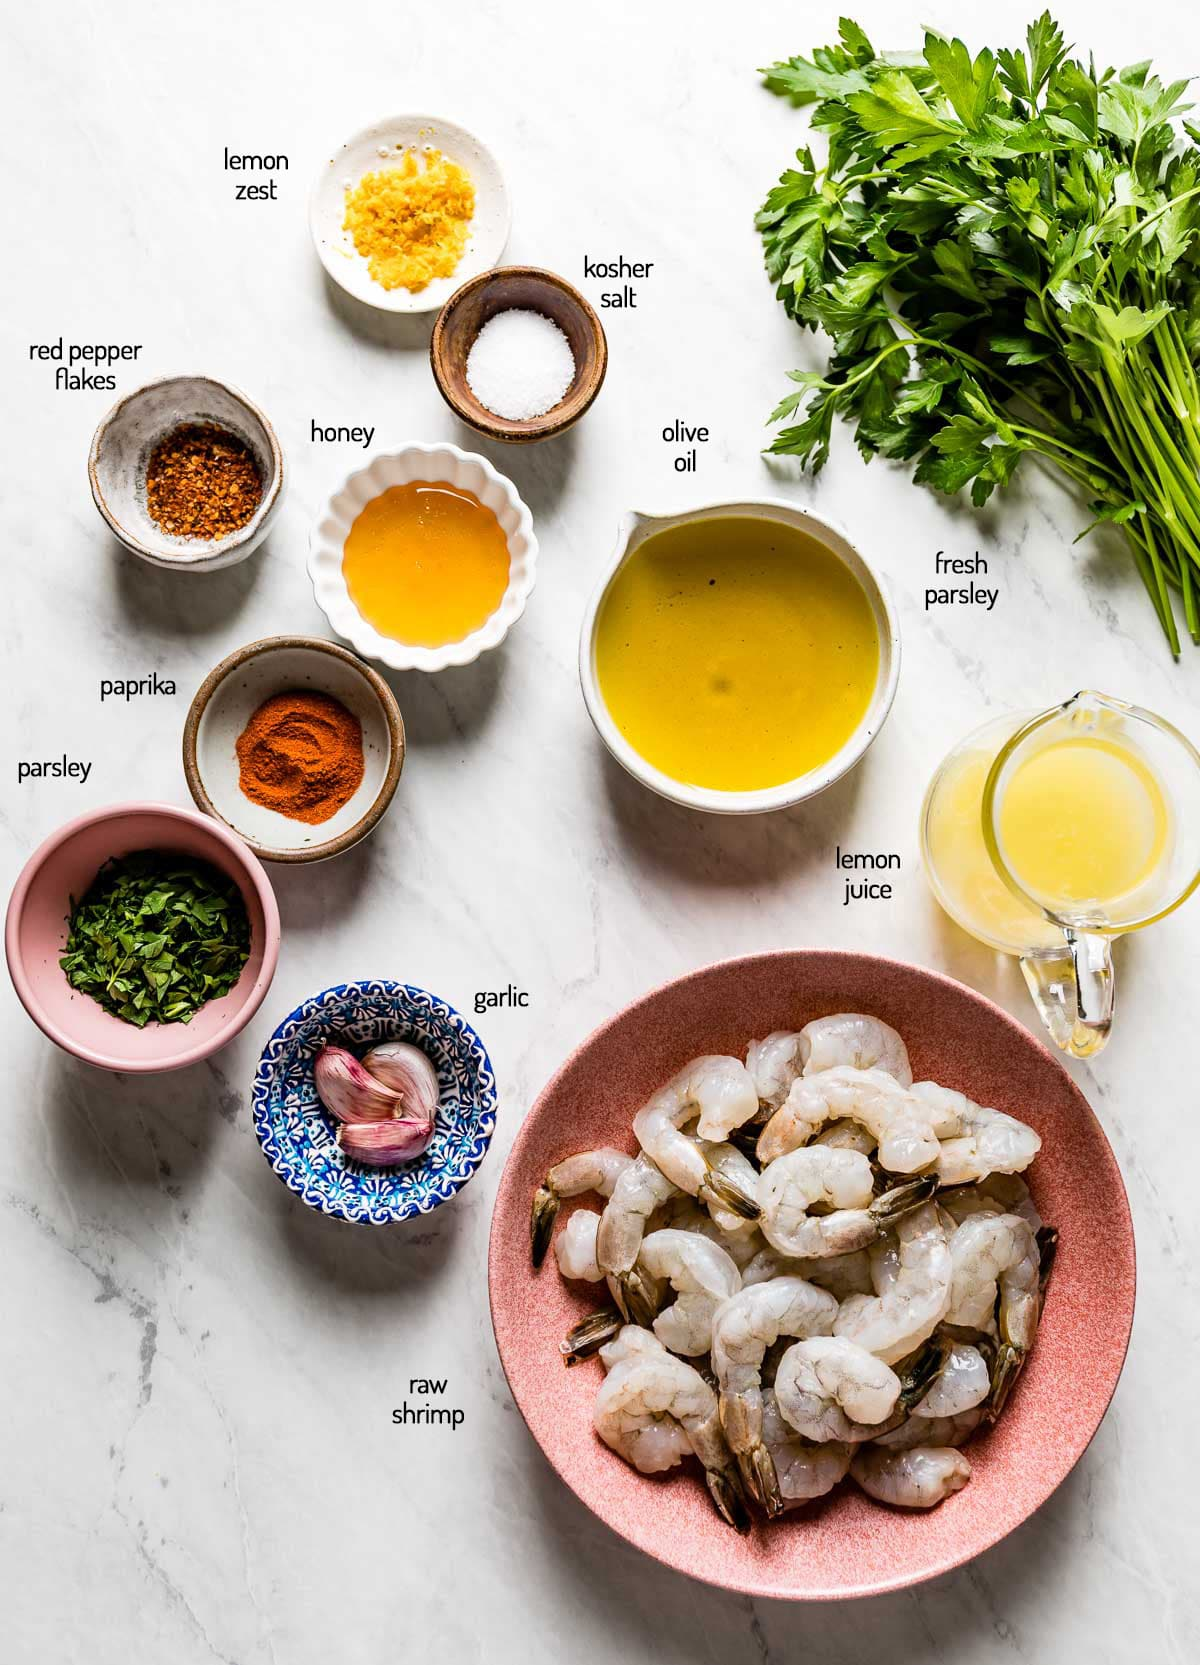 Shrimp marinade ingredients